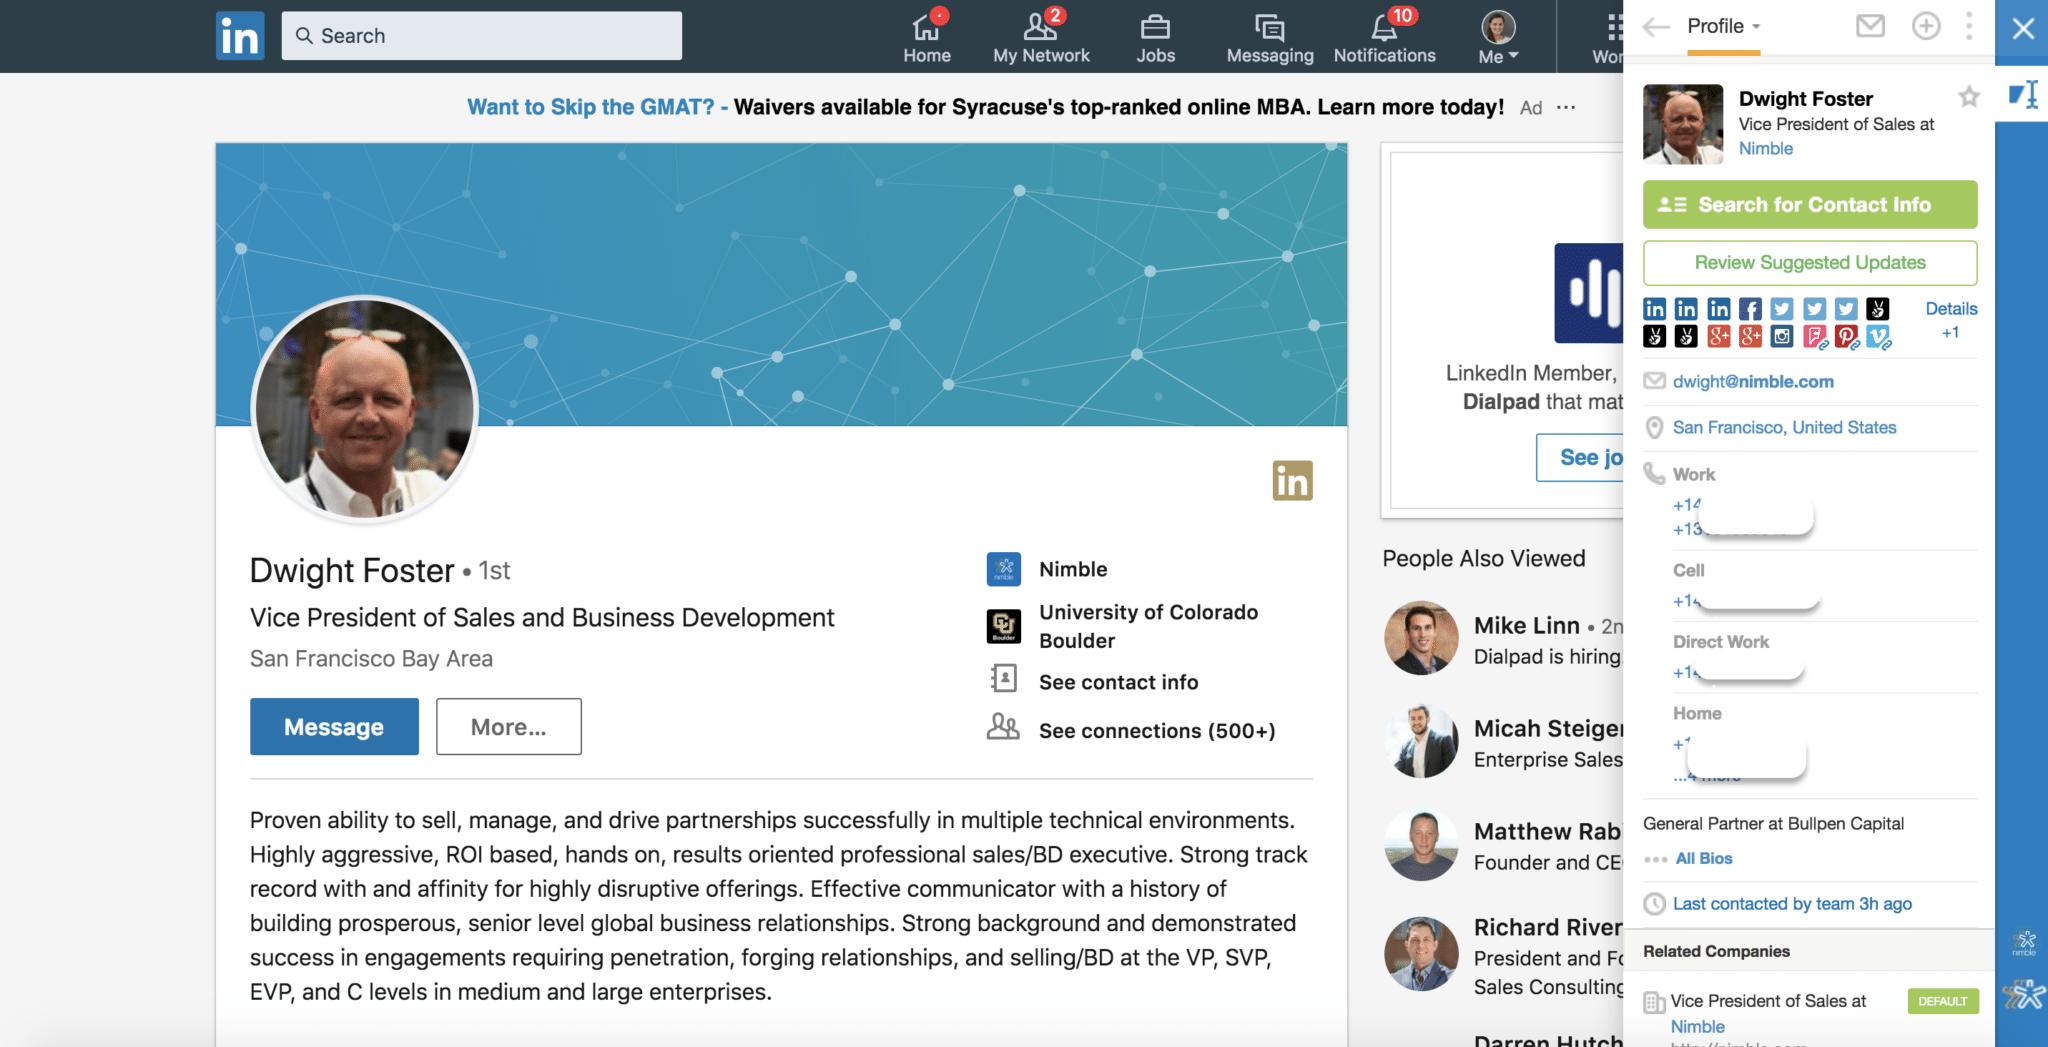 Dwight Foster - Nimble on LinkedIn